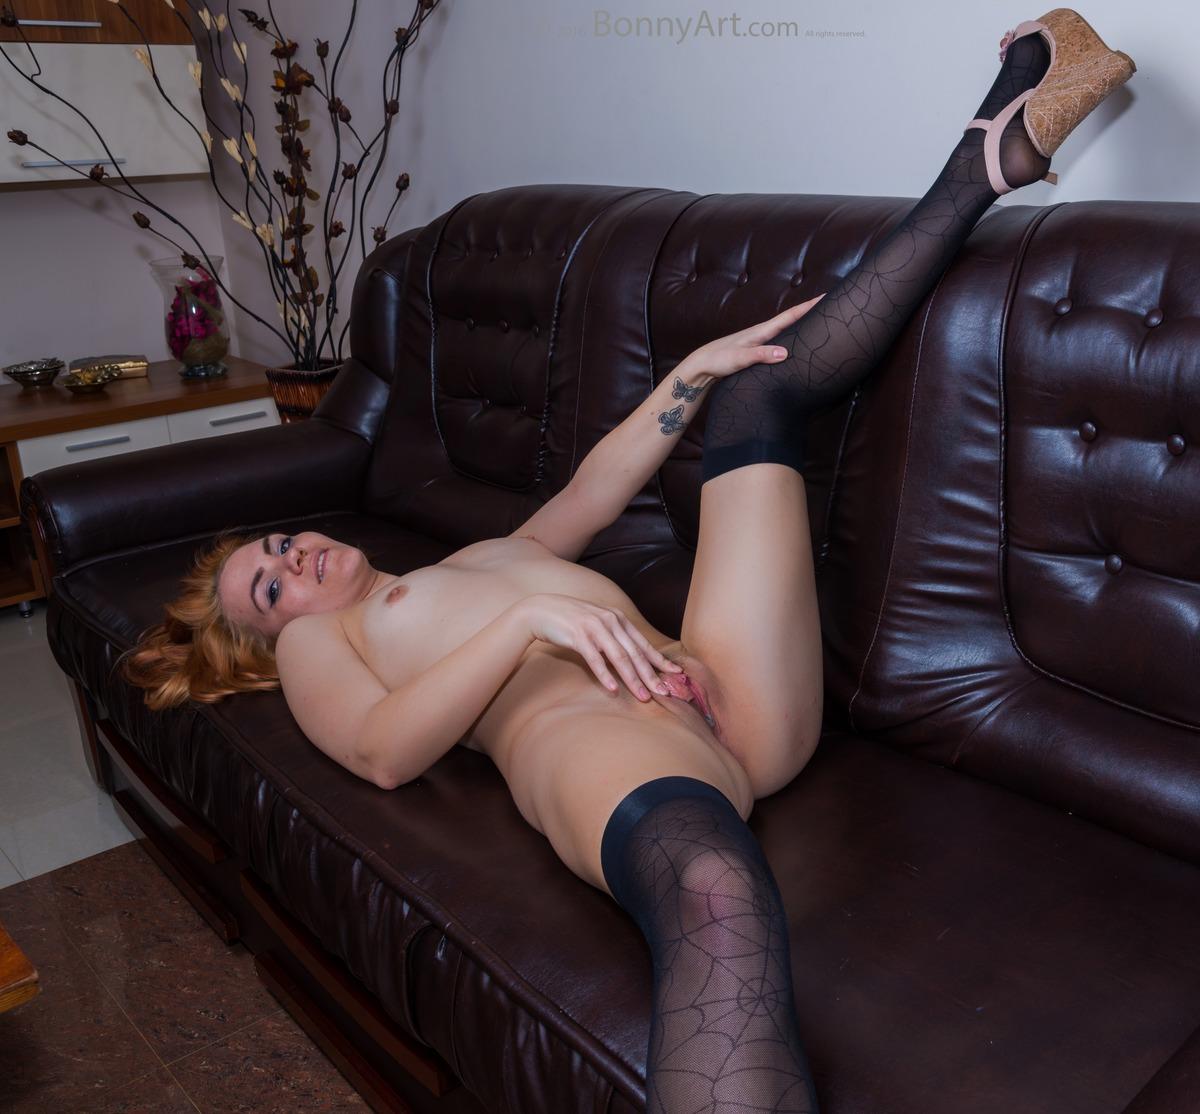 Moldavian Girl Spreading Legs and Pussy